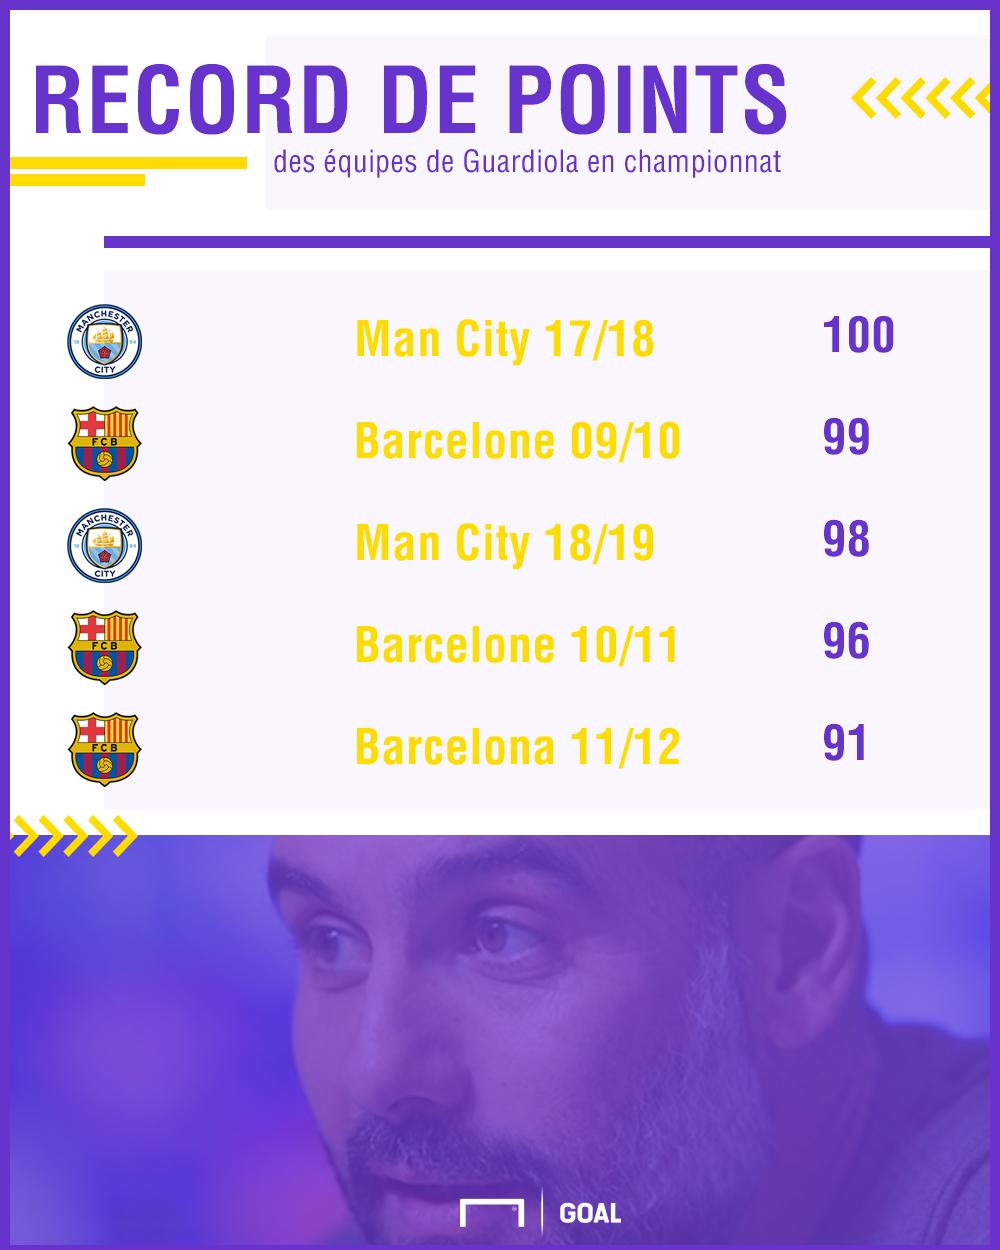 Guardiola record points